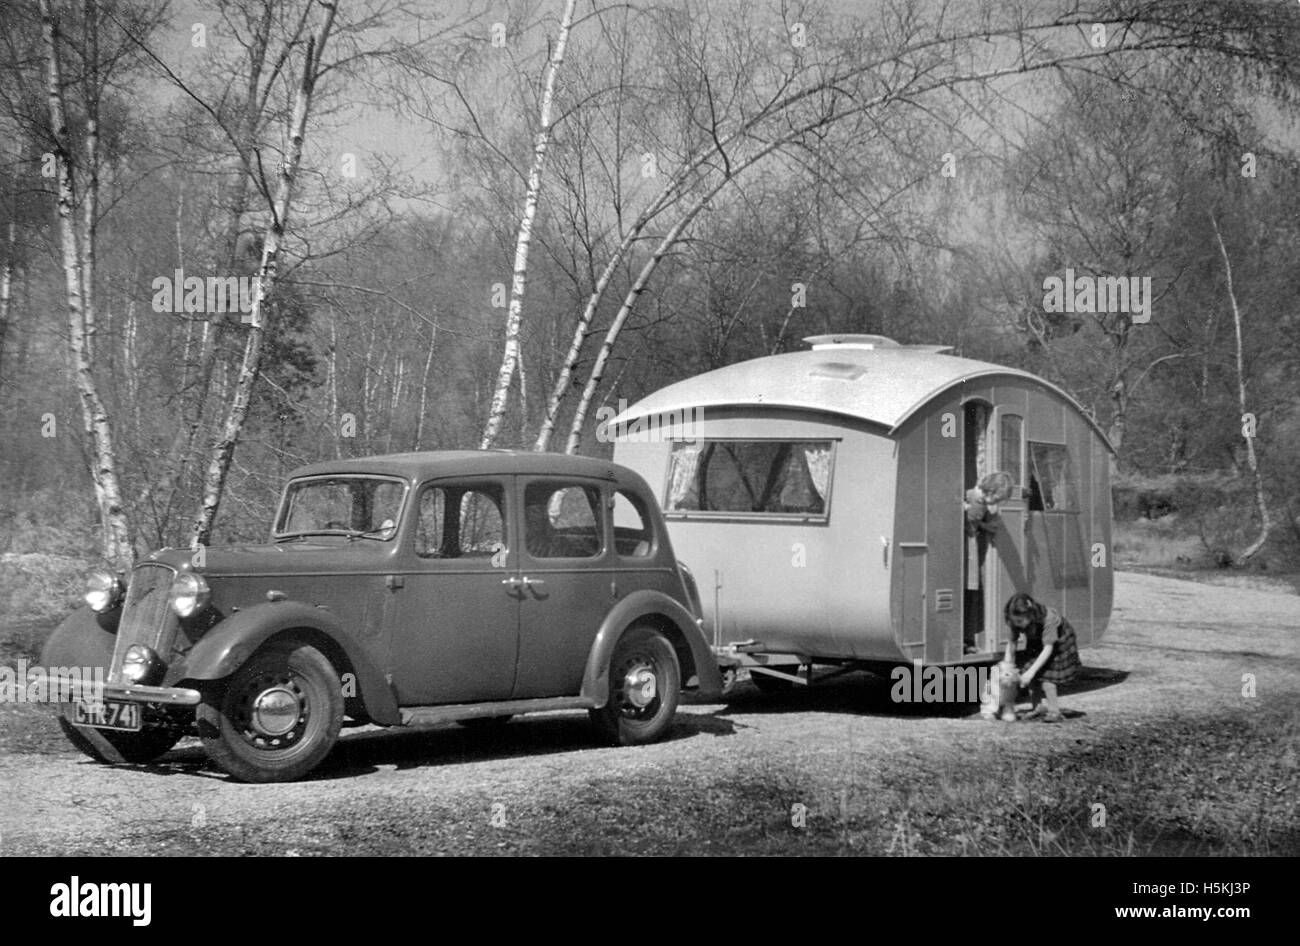 Austin Light 12/4 Ascot saloon with caravan - Stock Image